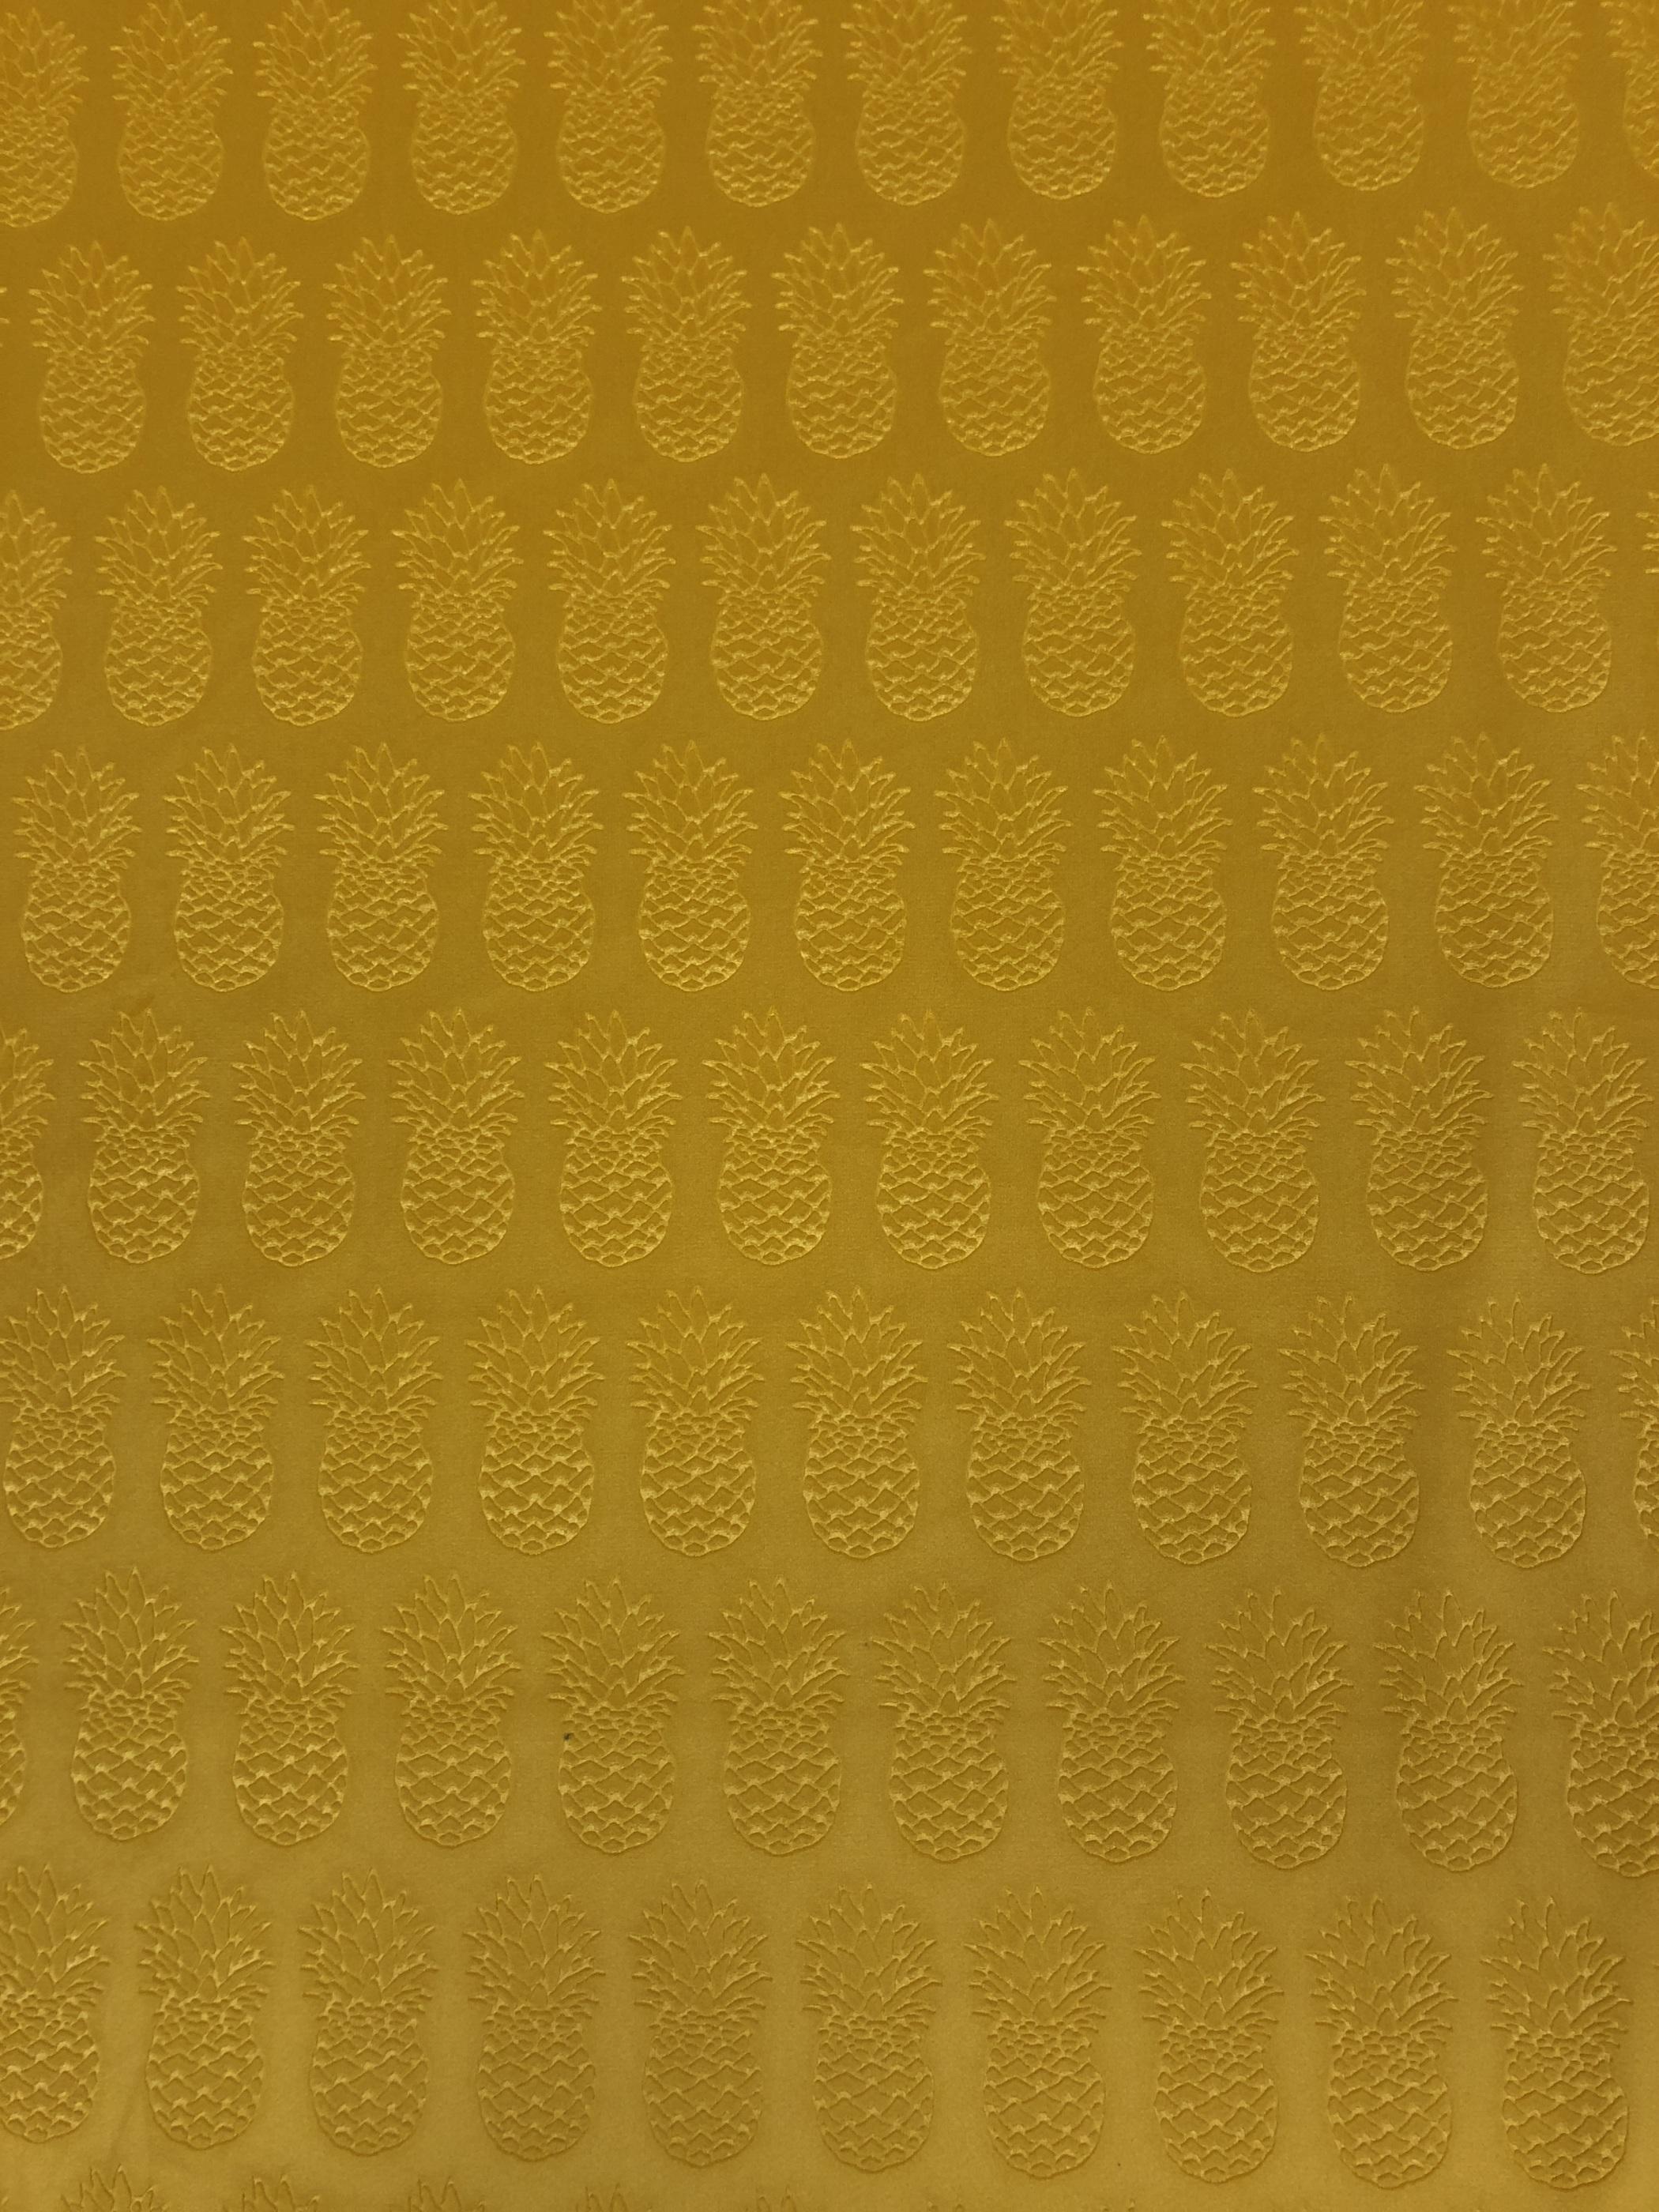 Ananas relief mönster gul sammet polyester metervara möbeltyg hemtextil Tyglust laholm